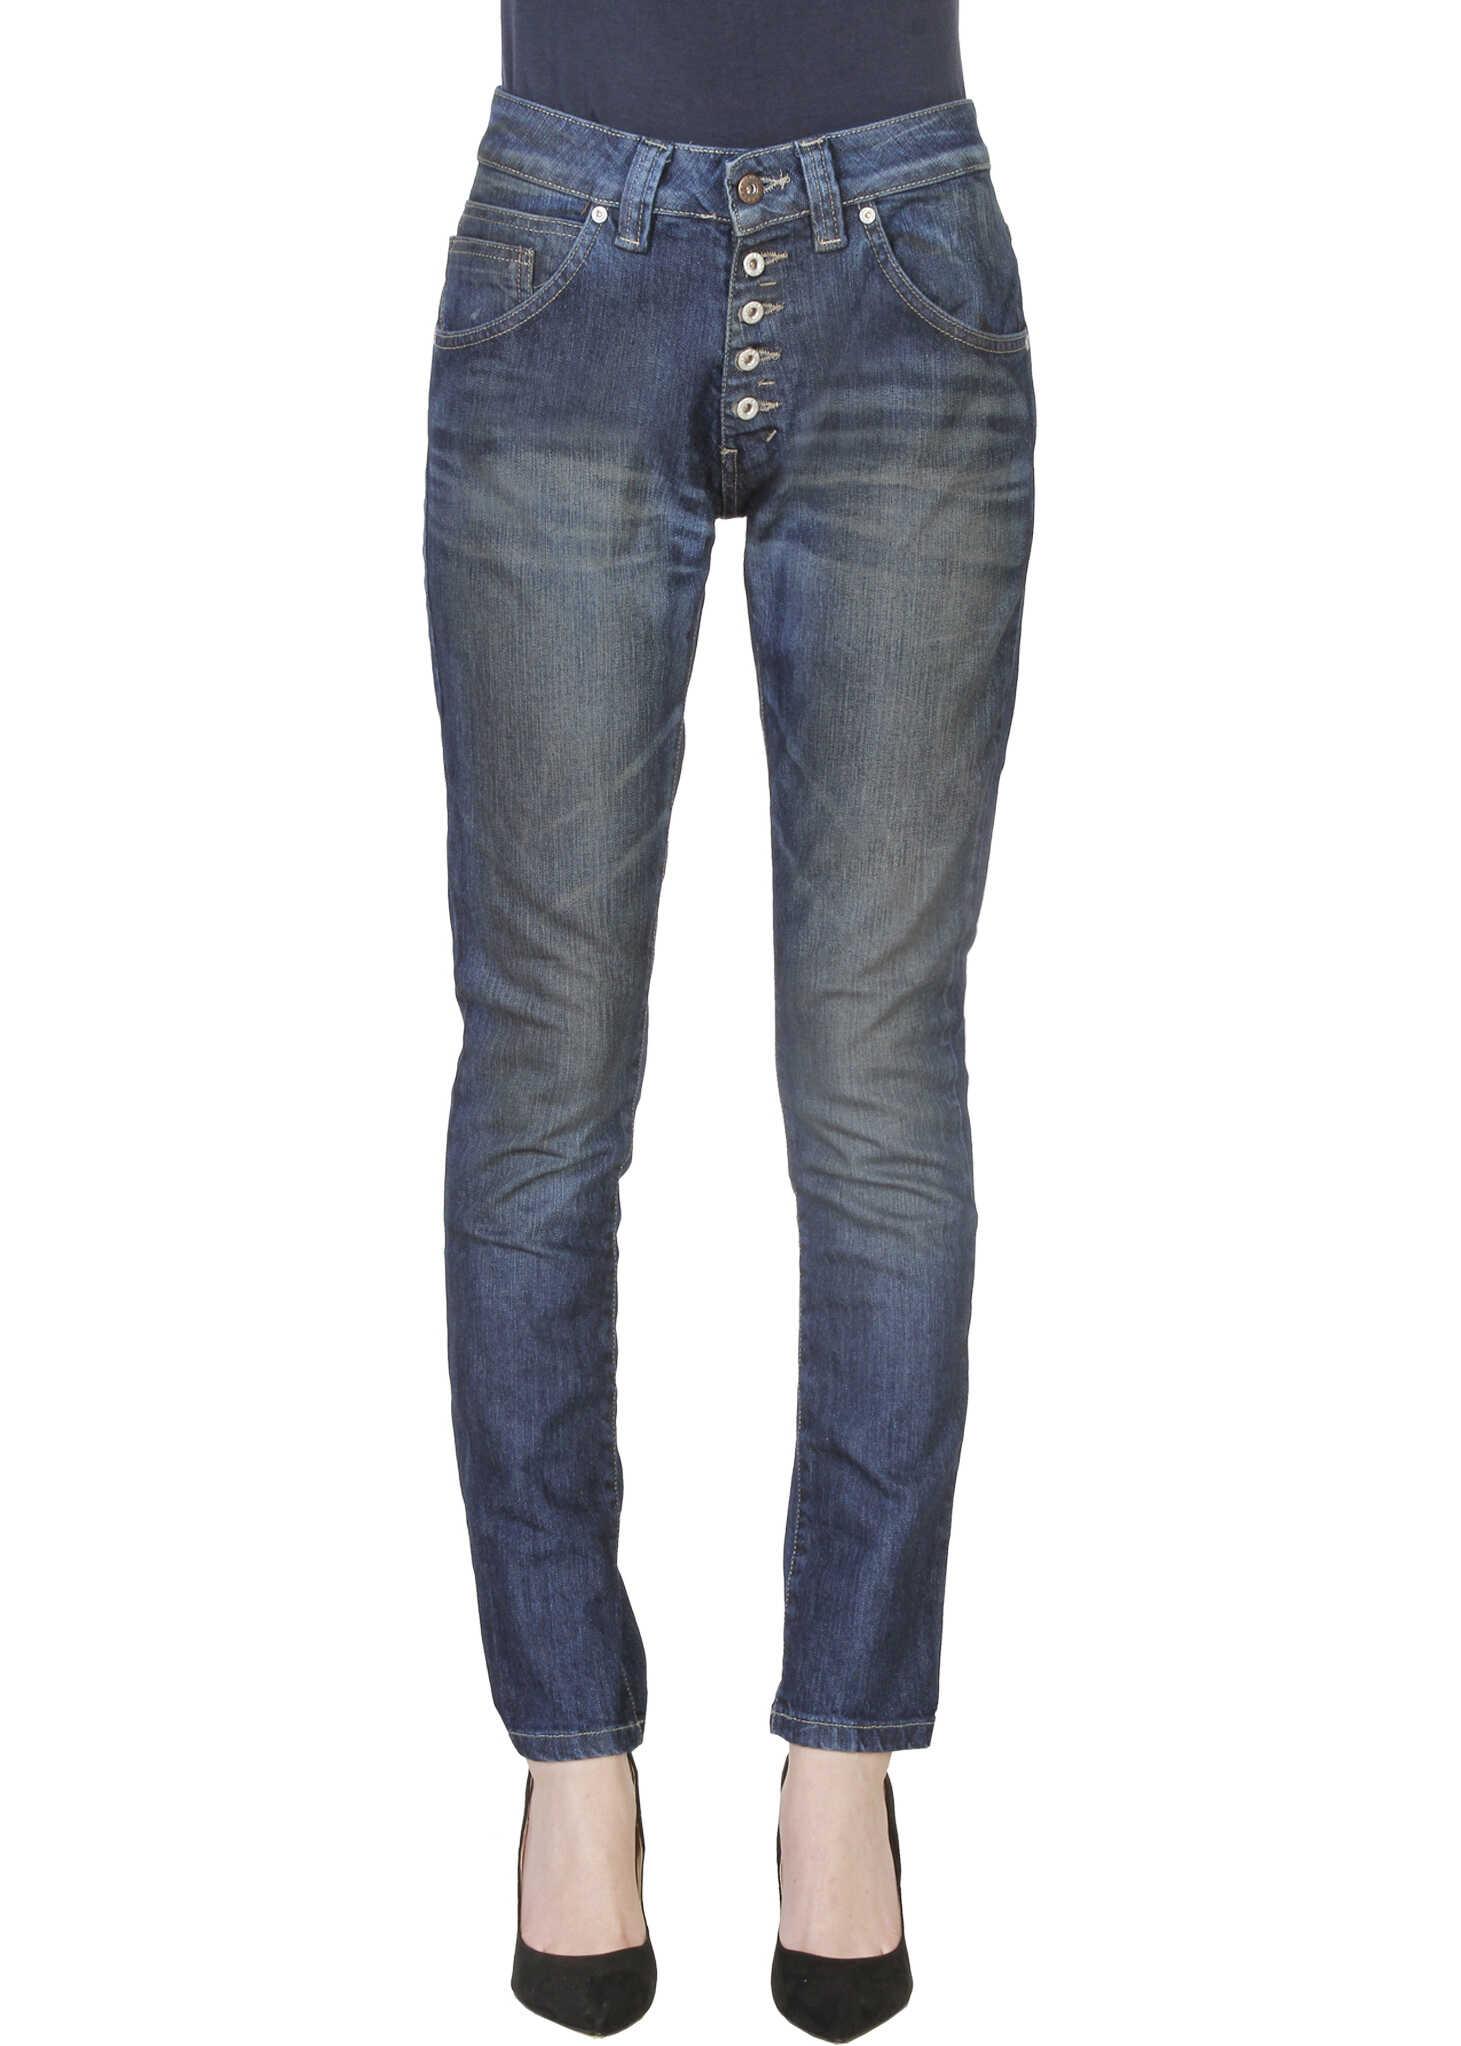 Blugi Femei Carrera Jeans 00771b_00970 Blue